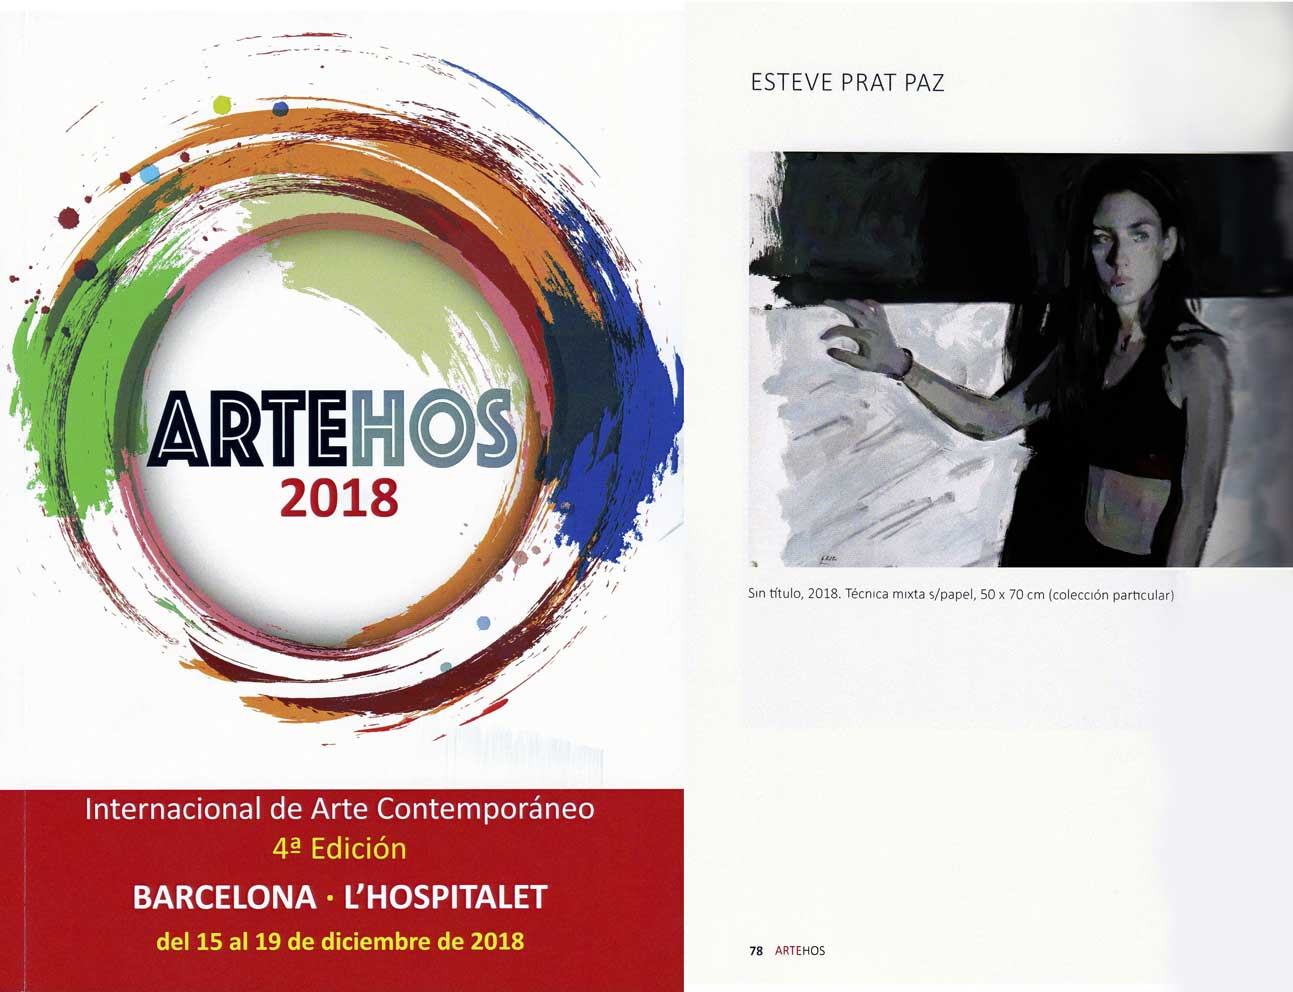 http://esteveprat.cat/wp-content/uploads/1-Cataleg-ARTEHOS-2018-Internacional-de-Arte-Contemporaneo-4-Edicion-BARCELONA-HOSPITALET.jpg